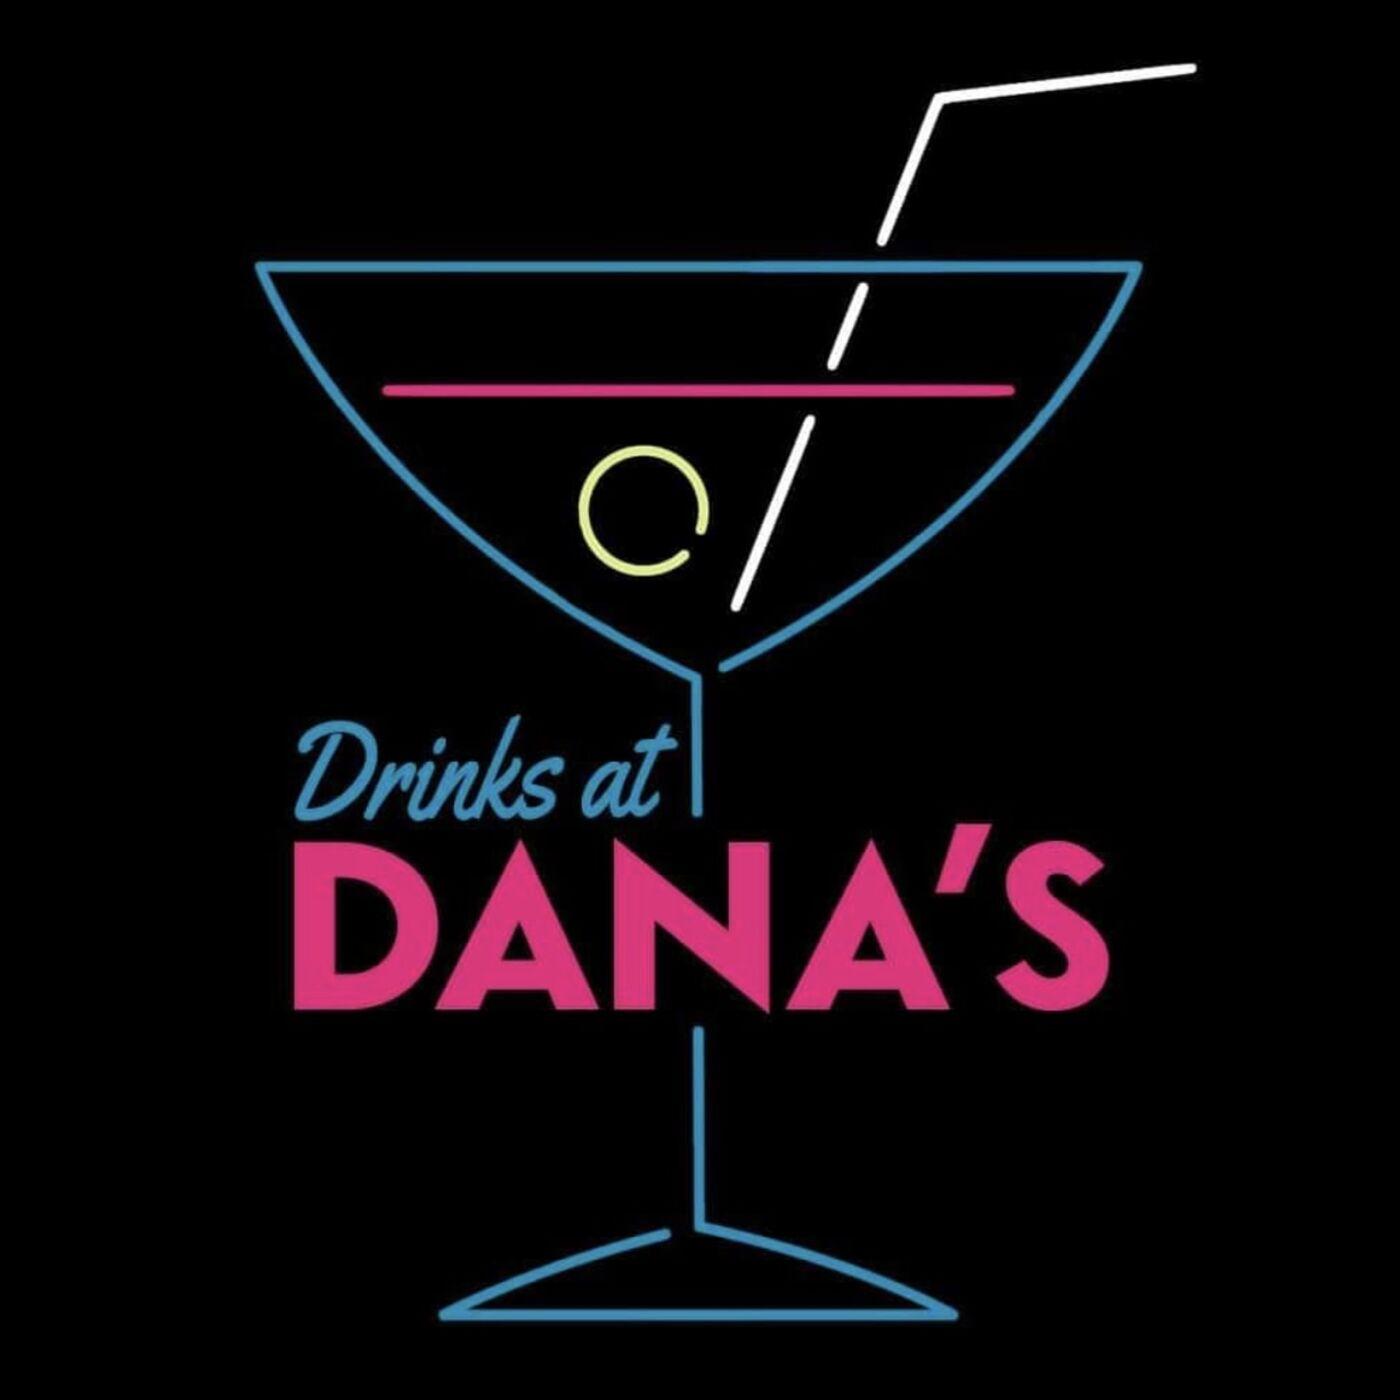 Drinks at Dana's - Episode 0